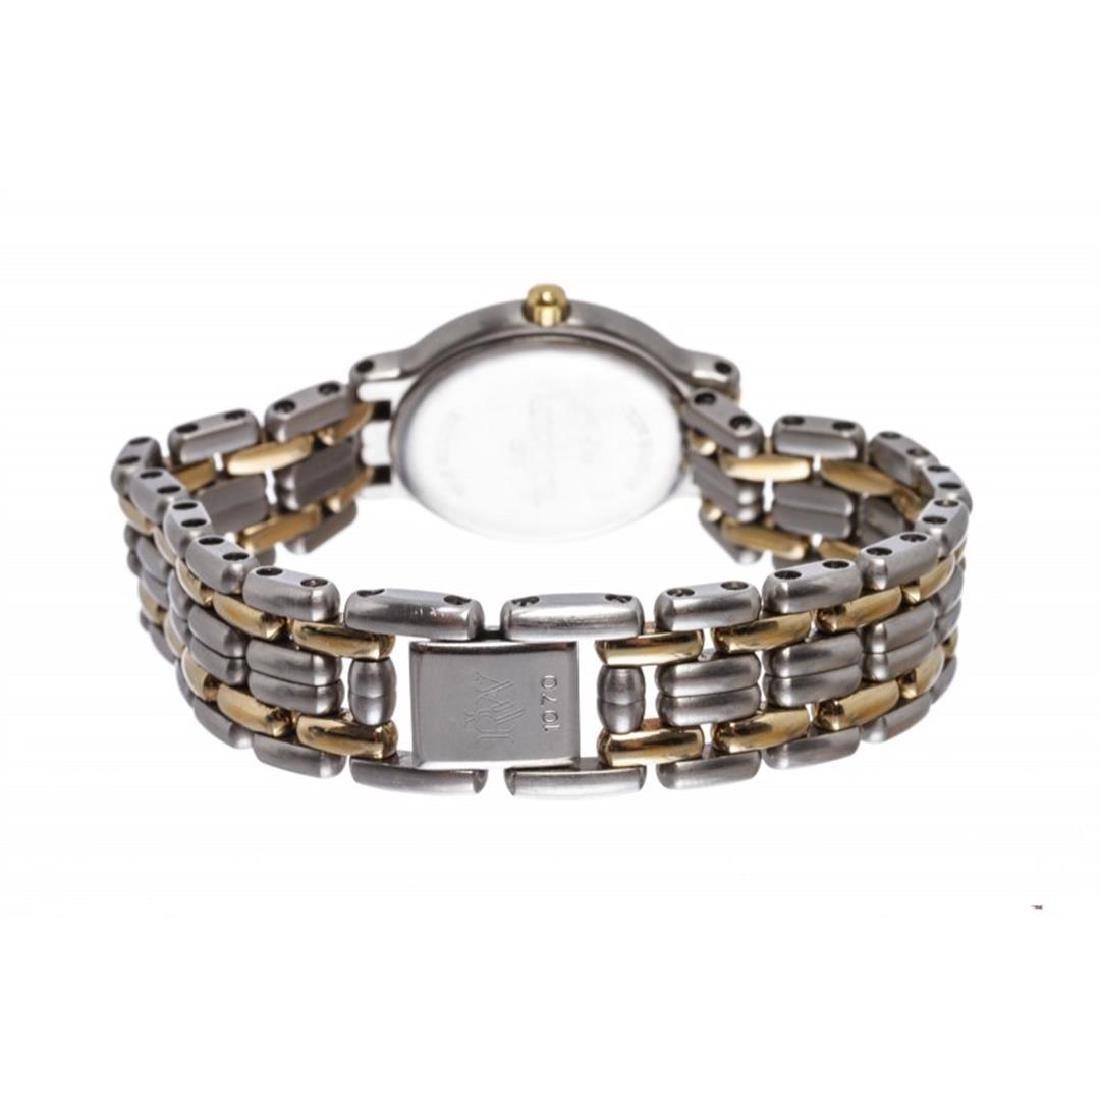 Raymond Weil Geneve Quartz Stainless Steel Wristwatch - 4